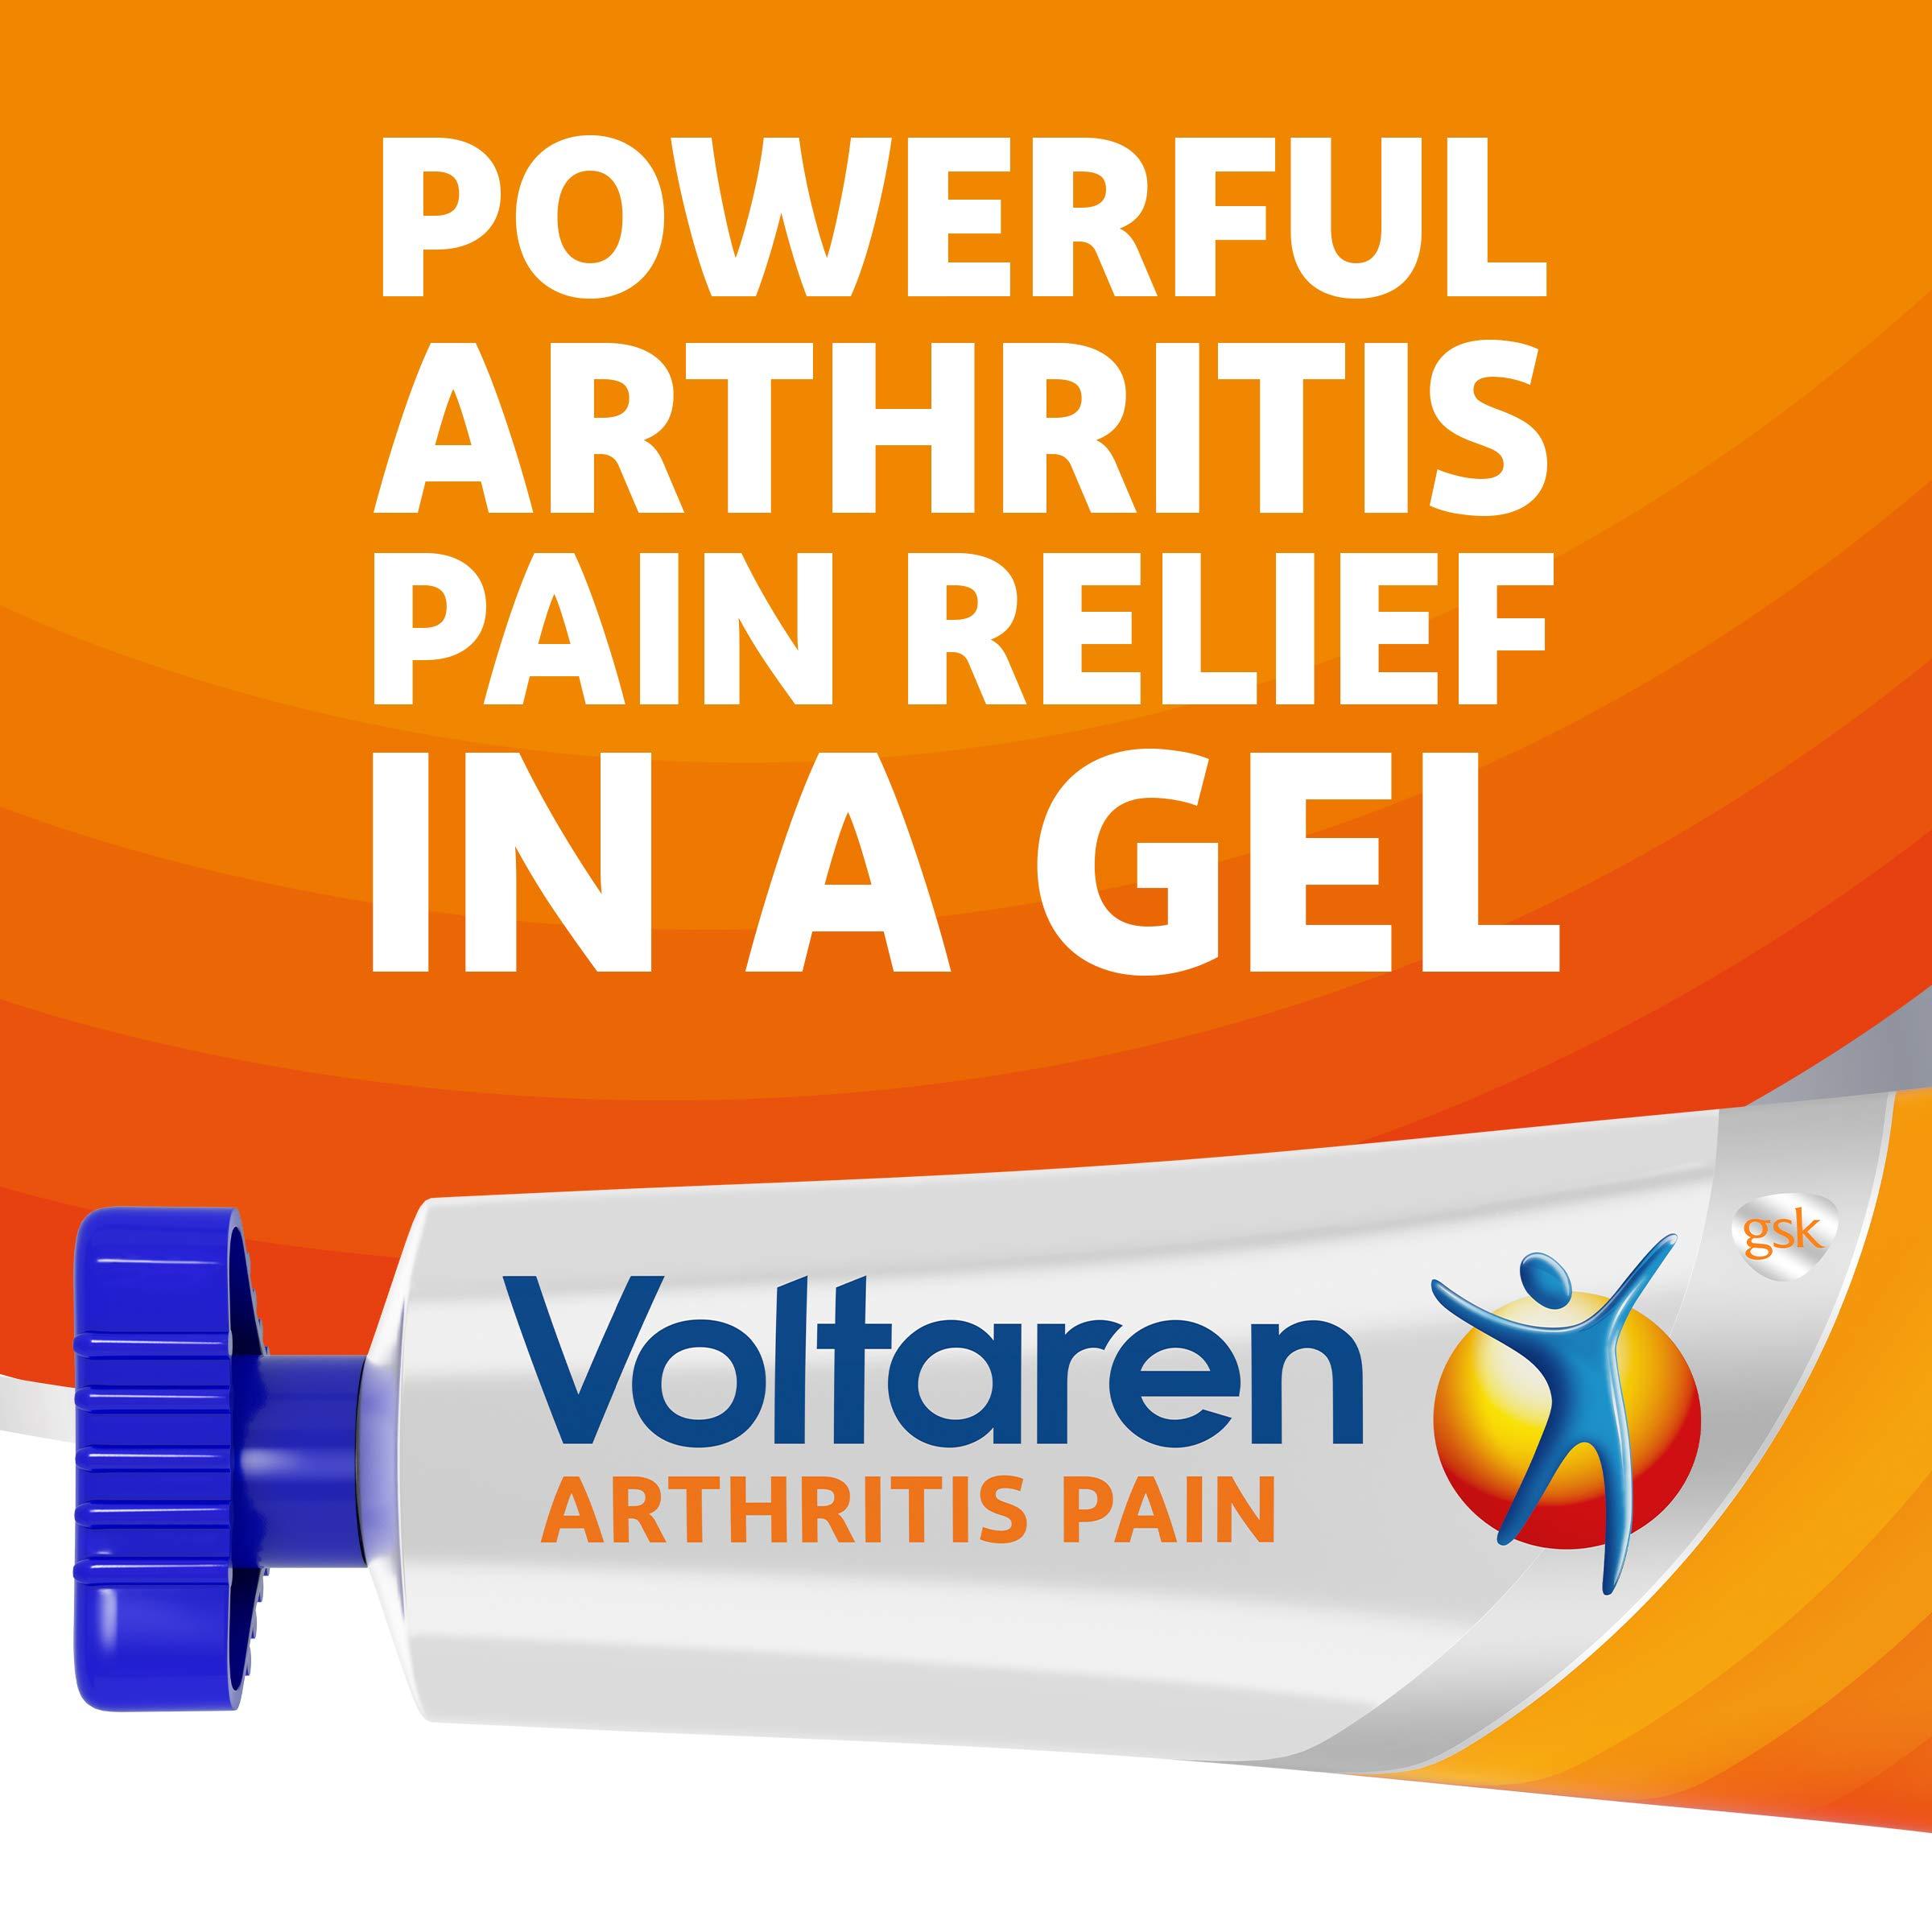 Voltaren Topical Arthritis Pain Relief Gel - 5.3 Oz 150g Tube Value Size